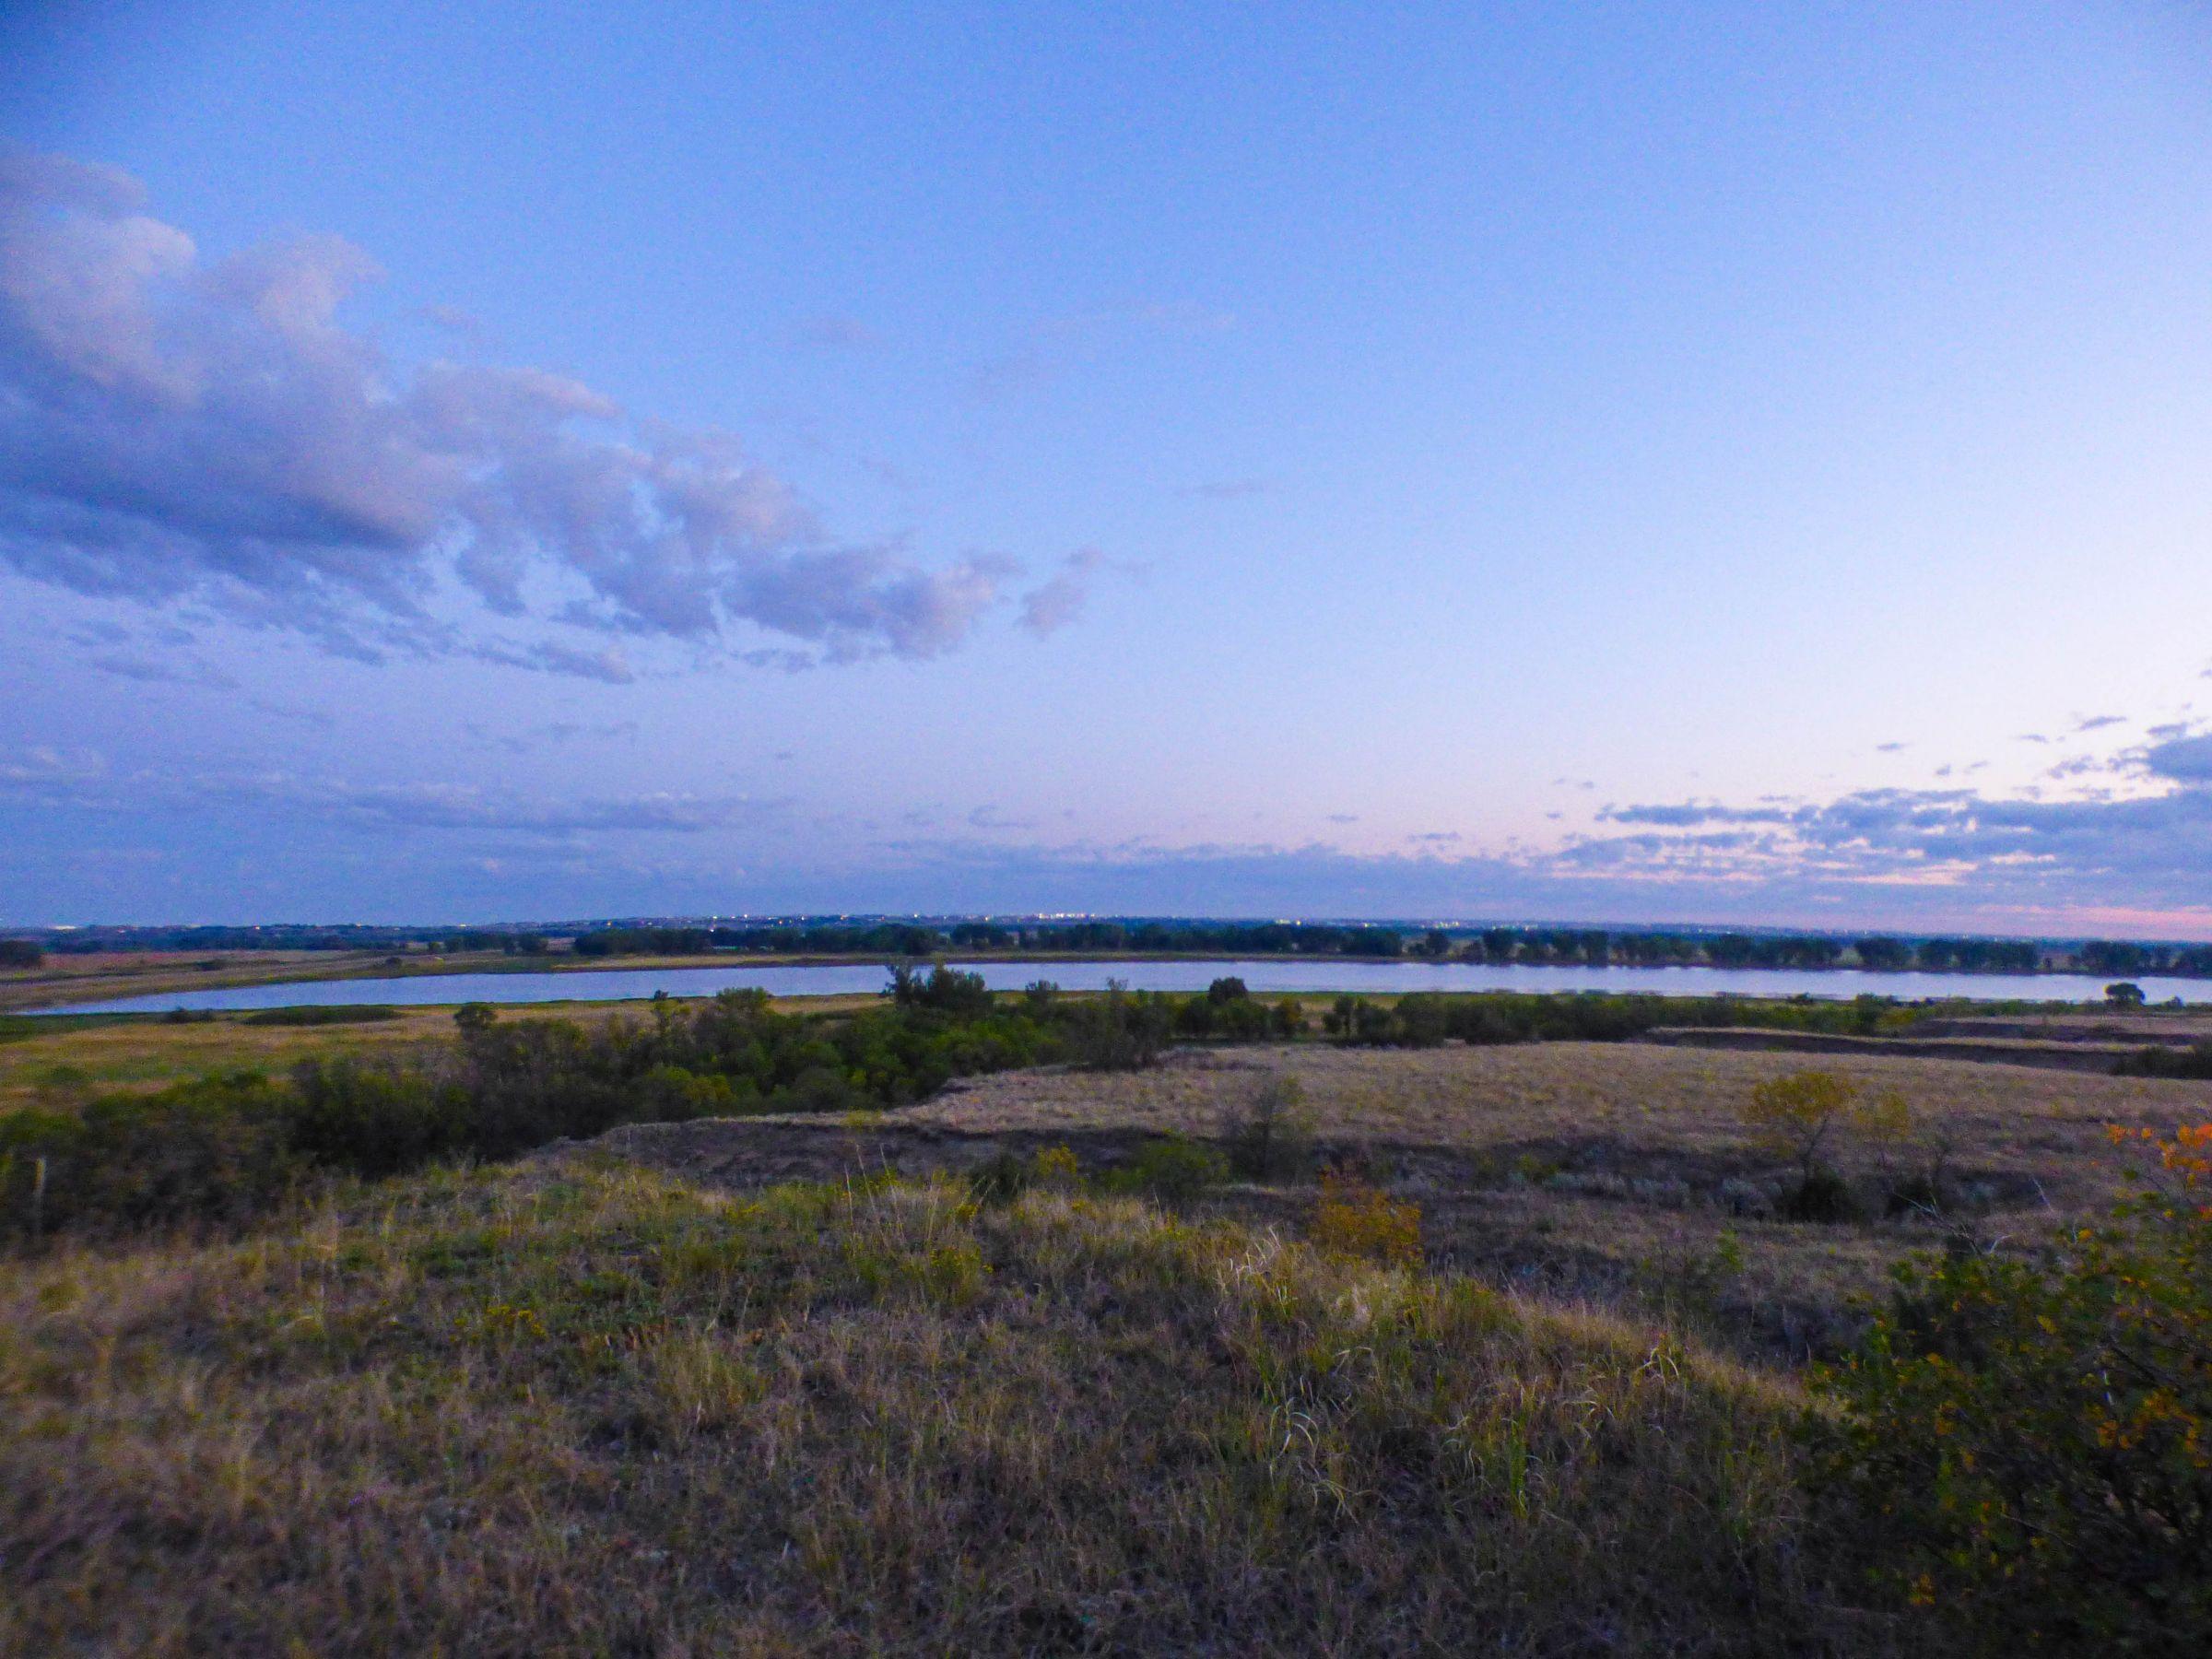 auctions-land-mckenzie-county-north-dakota-270-acres-listing-number-15735-5-2021-09-10-011325.jpg